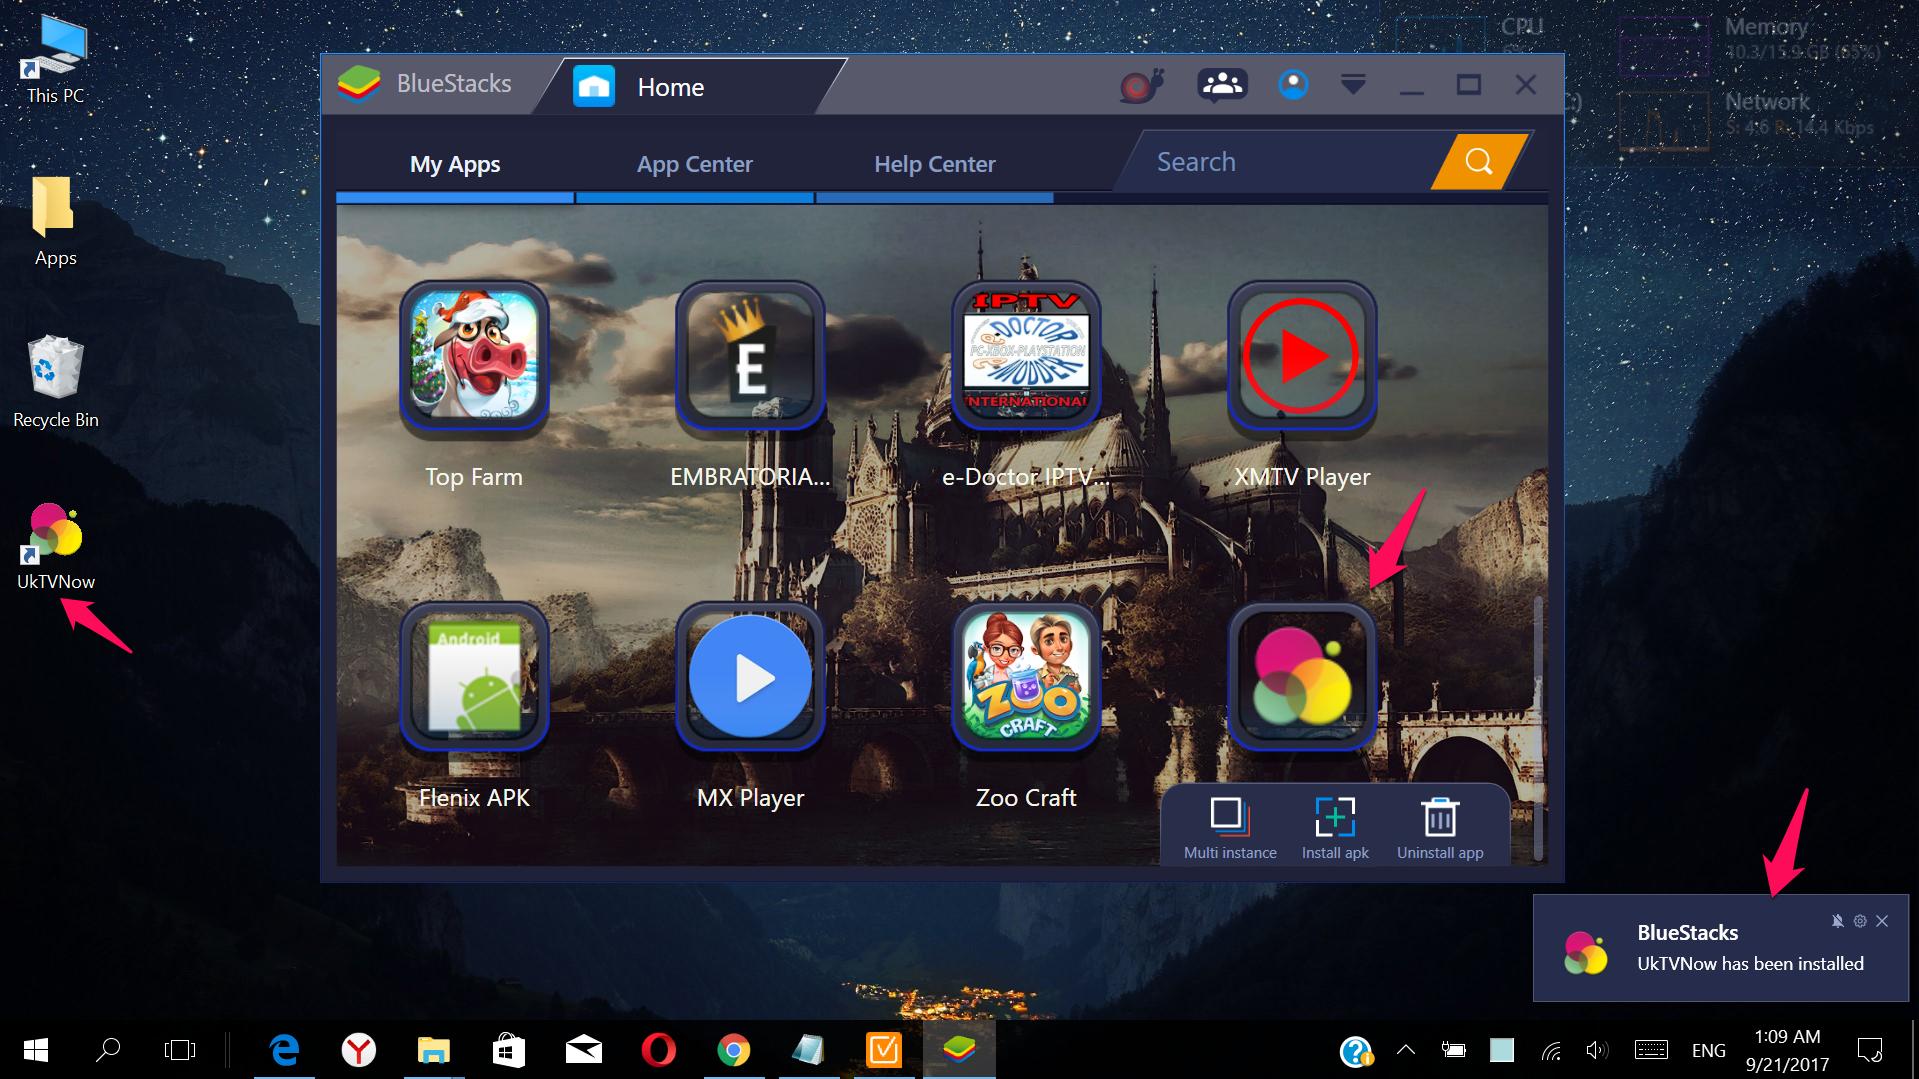 UKTvNow_for-PC-Windows-10